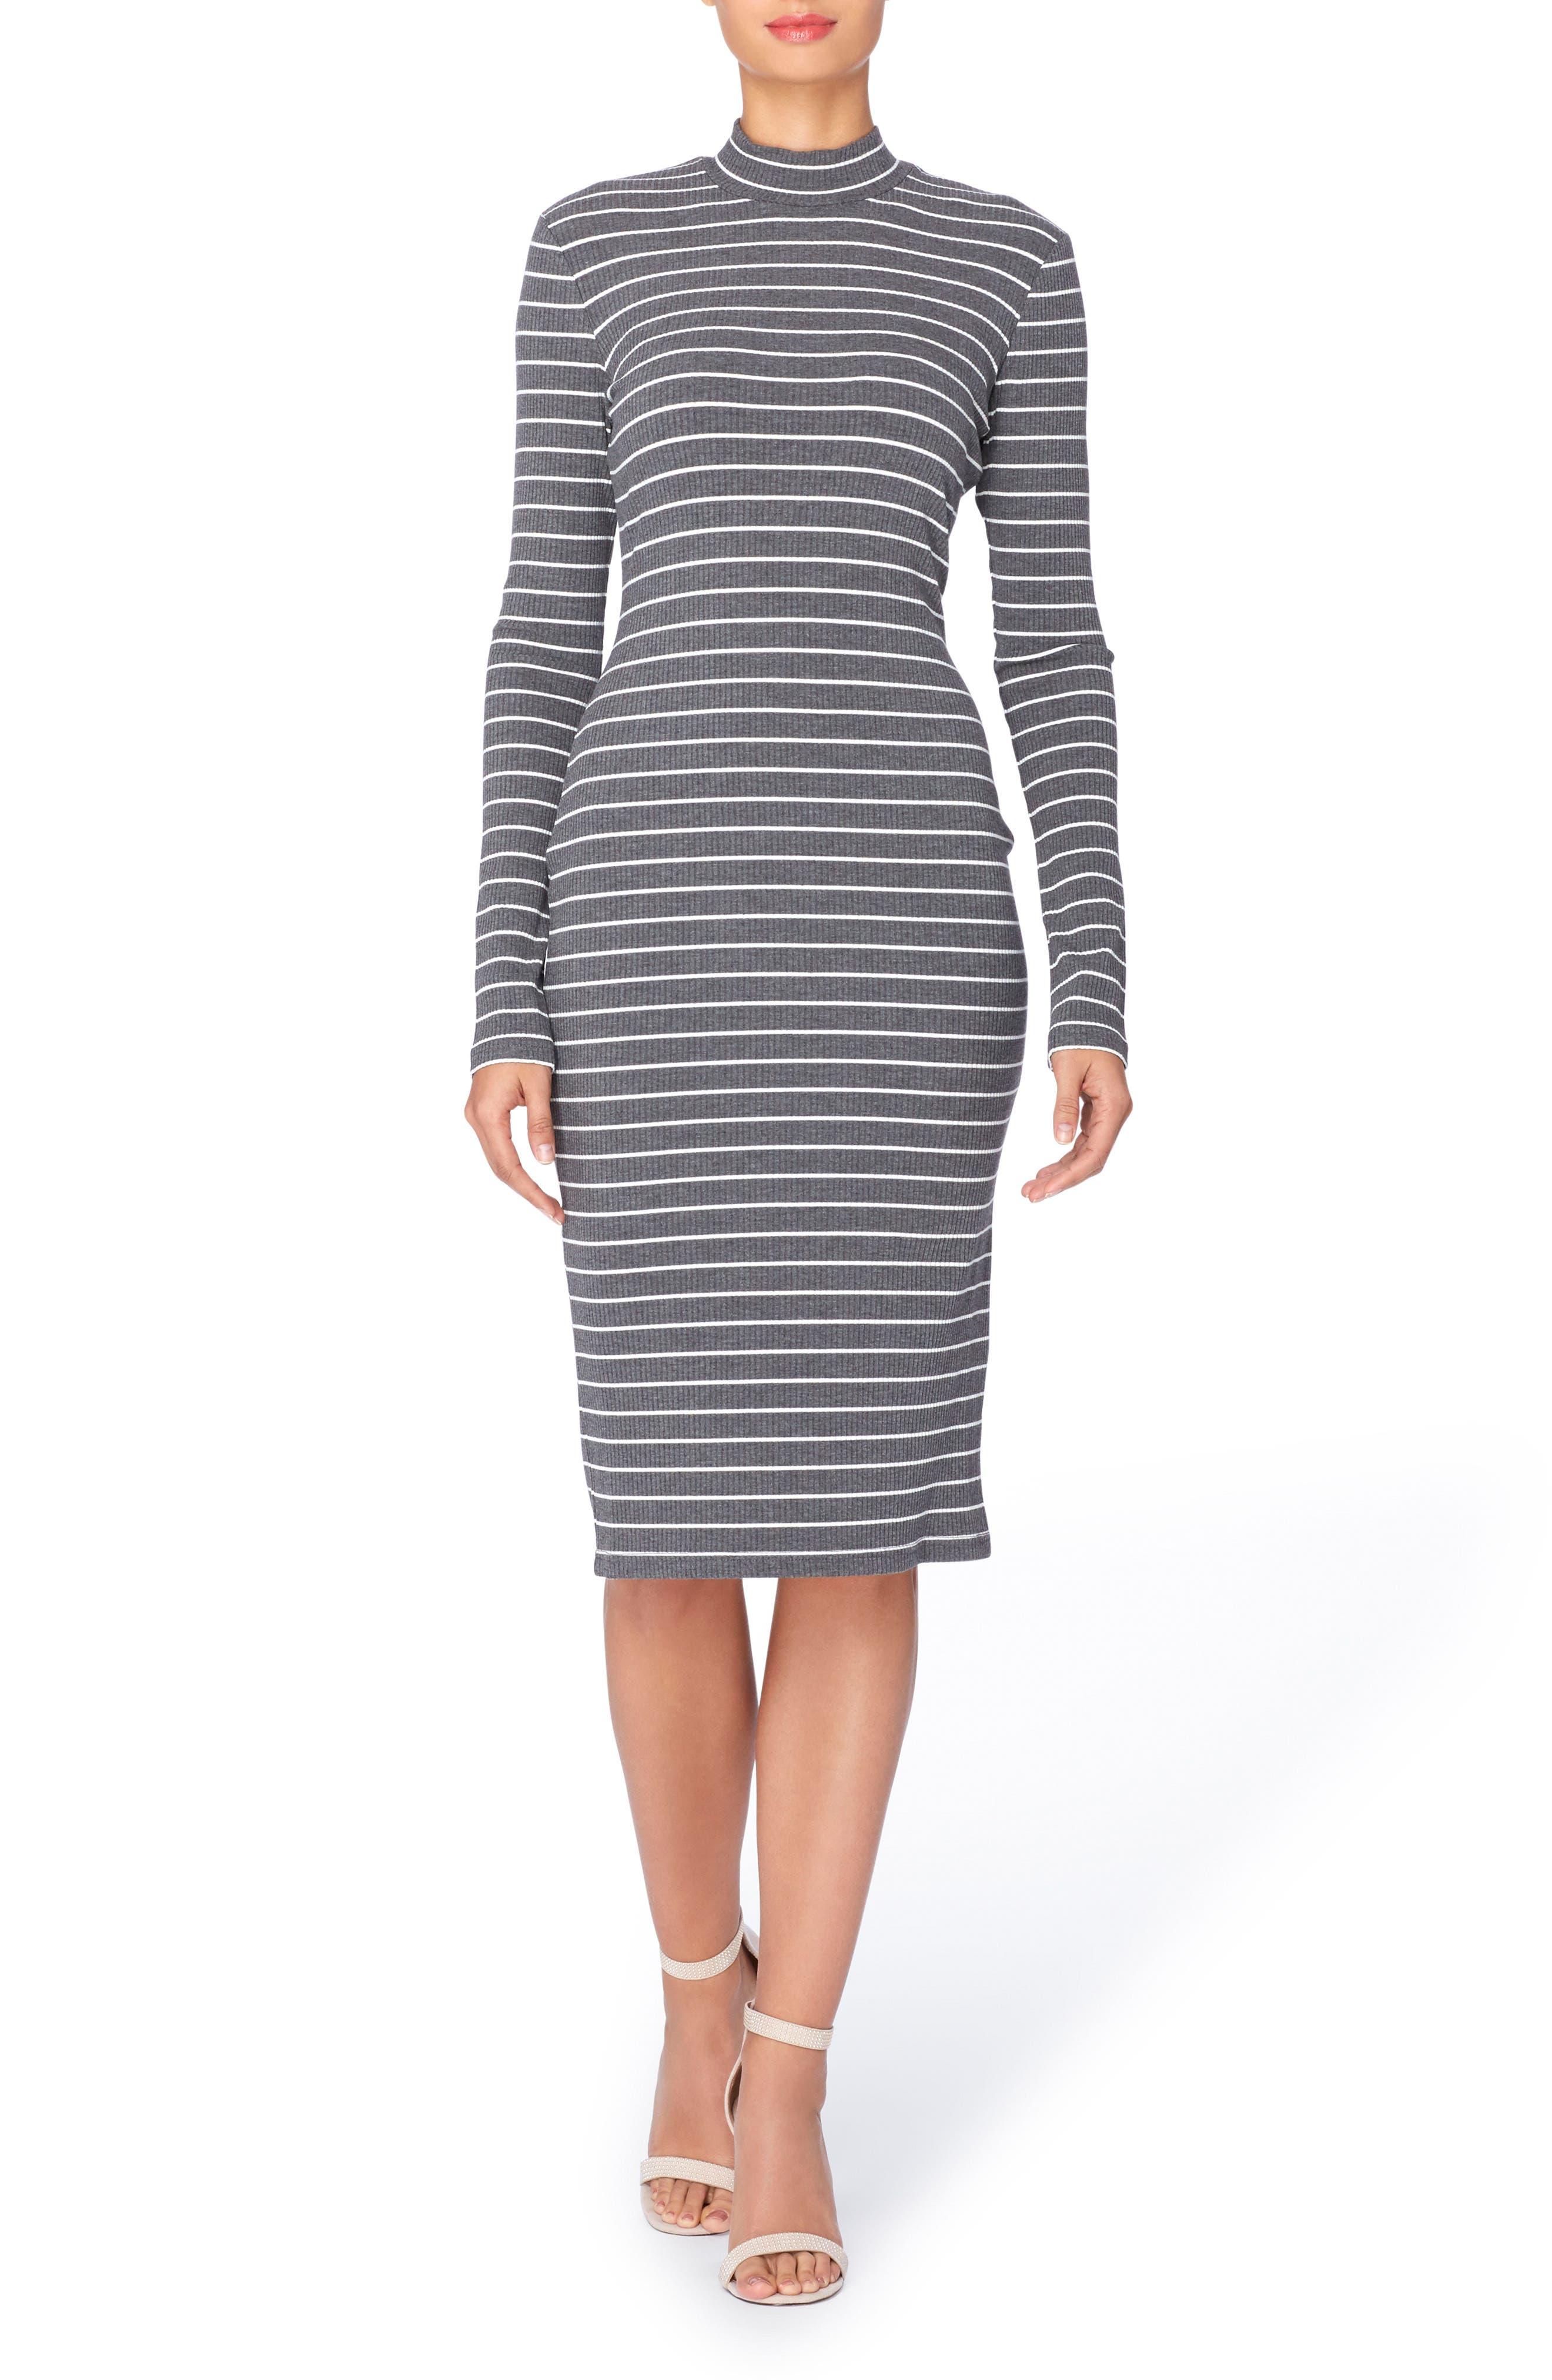 Alternate Image 1 Selected - Catherine Catherine Malandrino Kristiana Stripe Knit Midi Dress